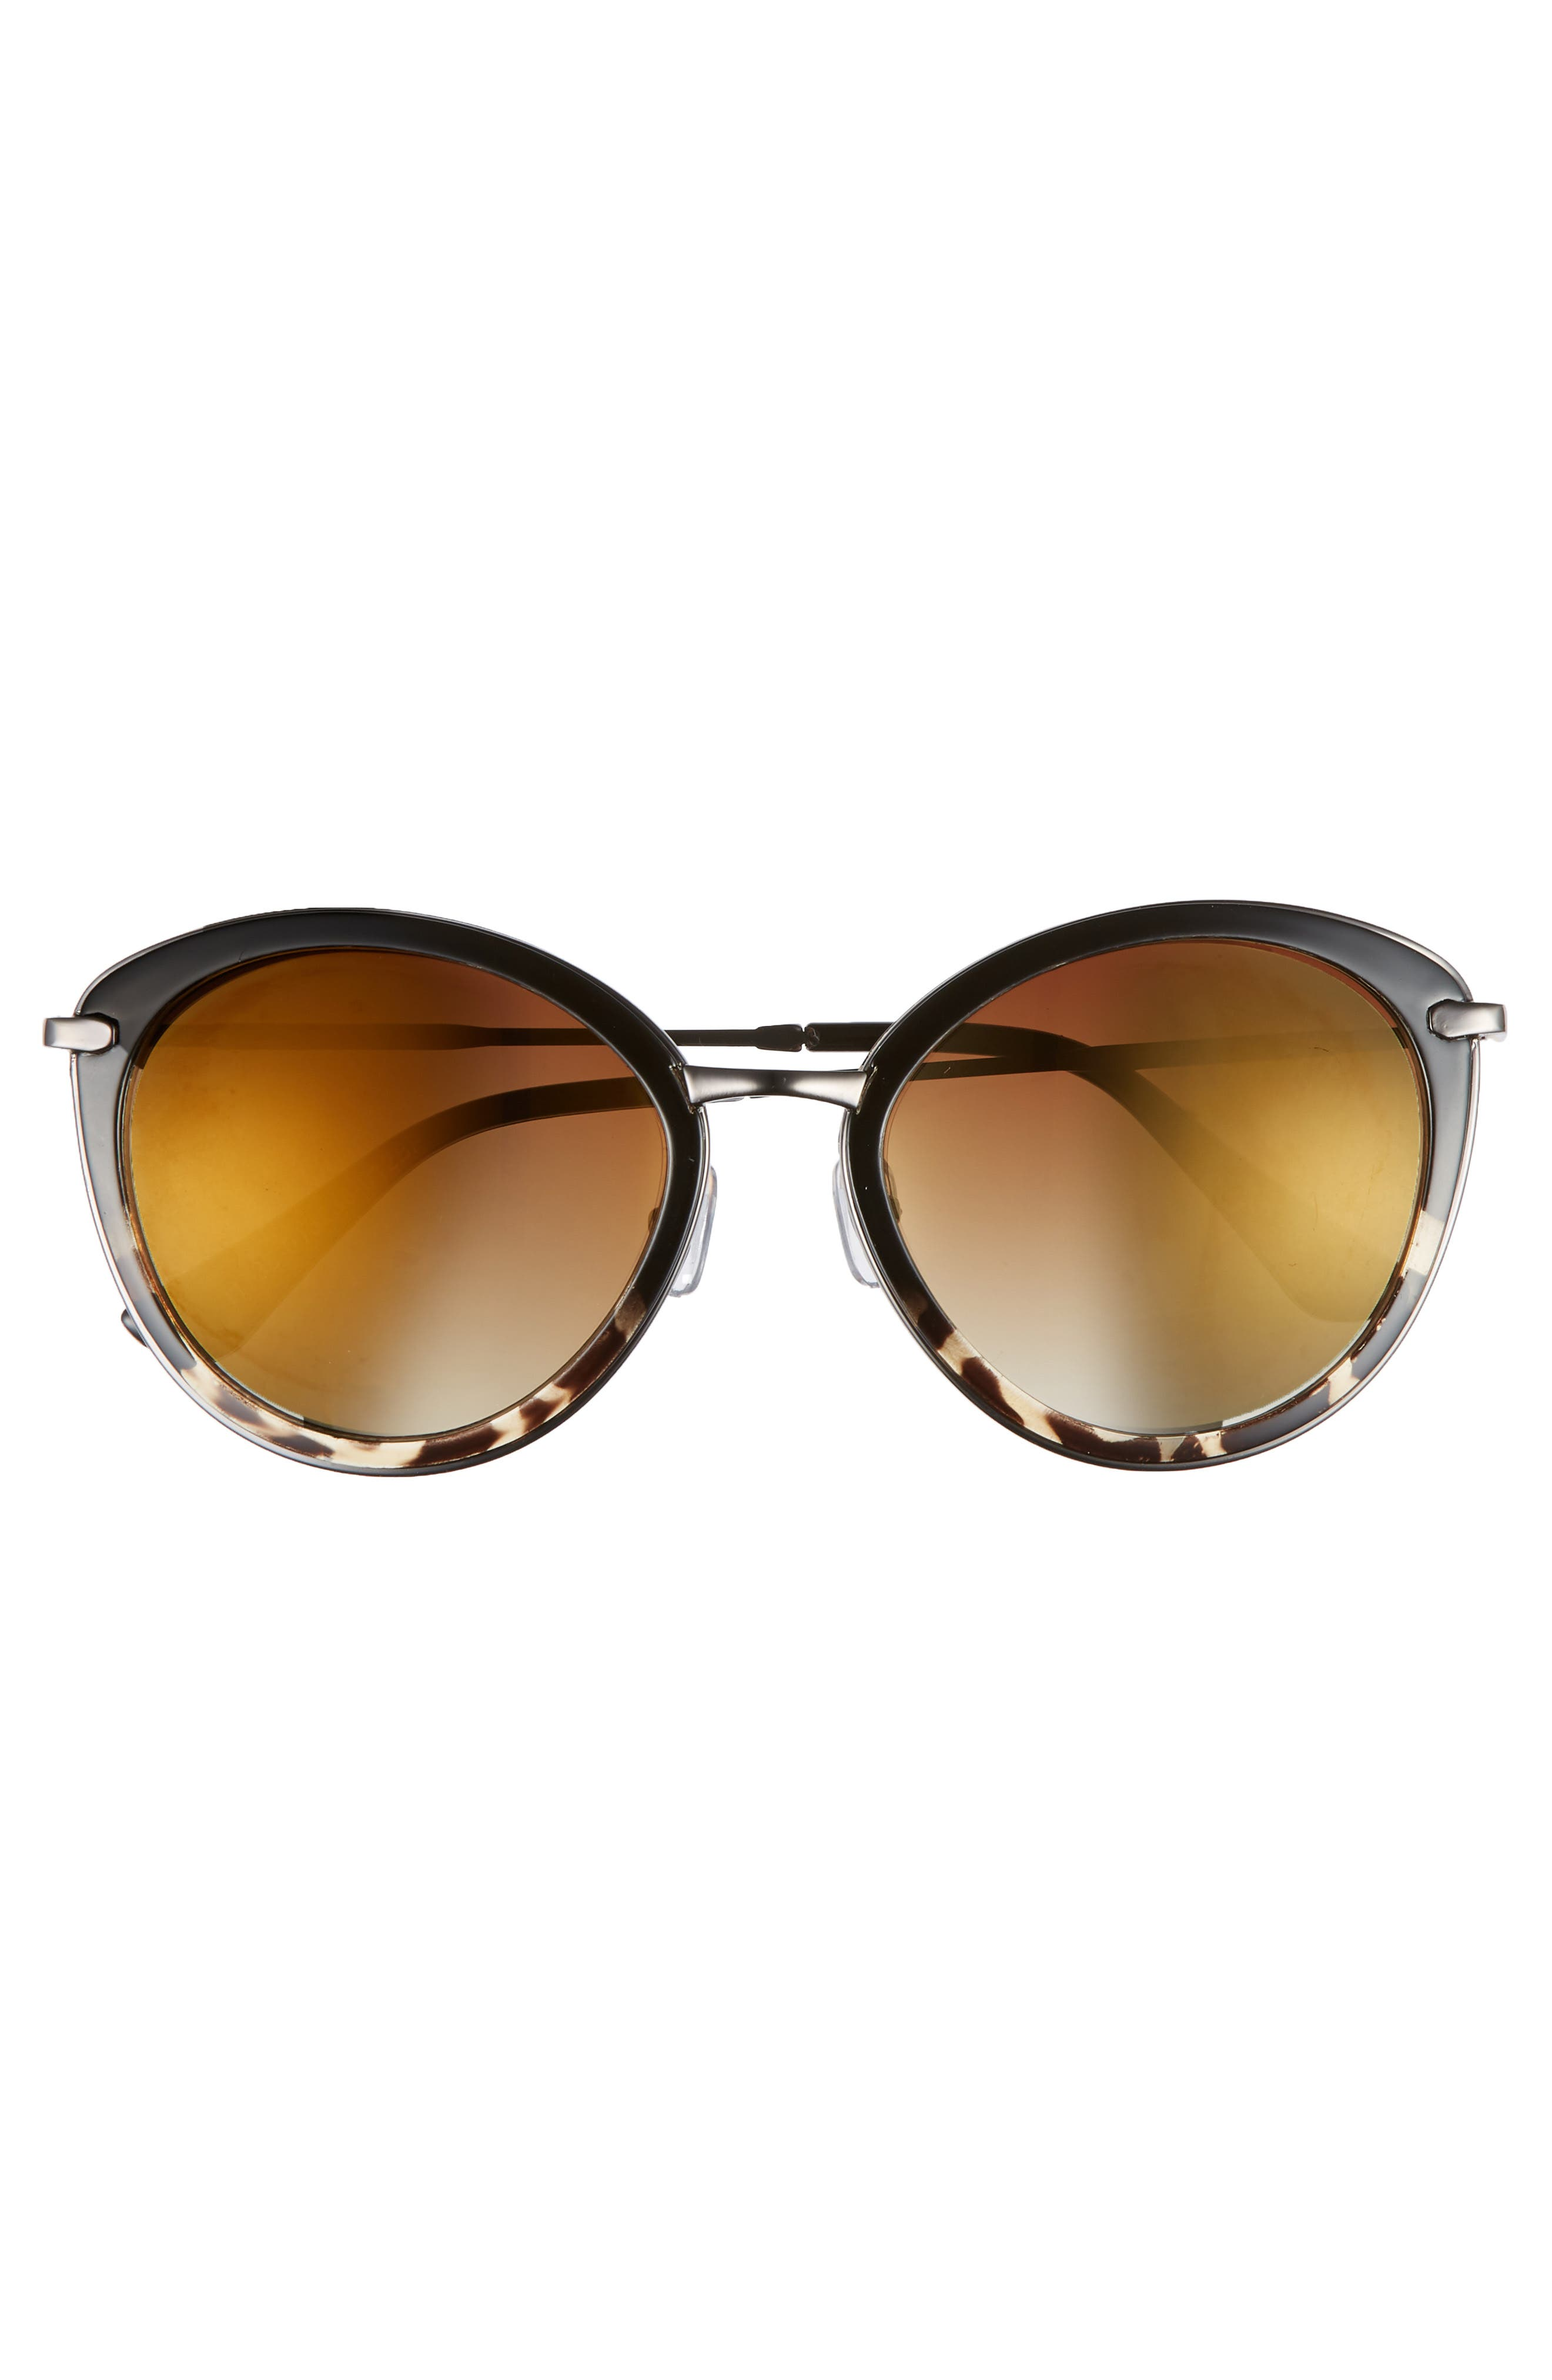 54mm Round Sunglasses,                             Alternate thumbnail 3, color,                             Black/ Tort